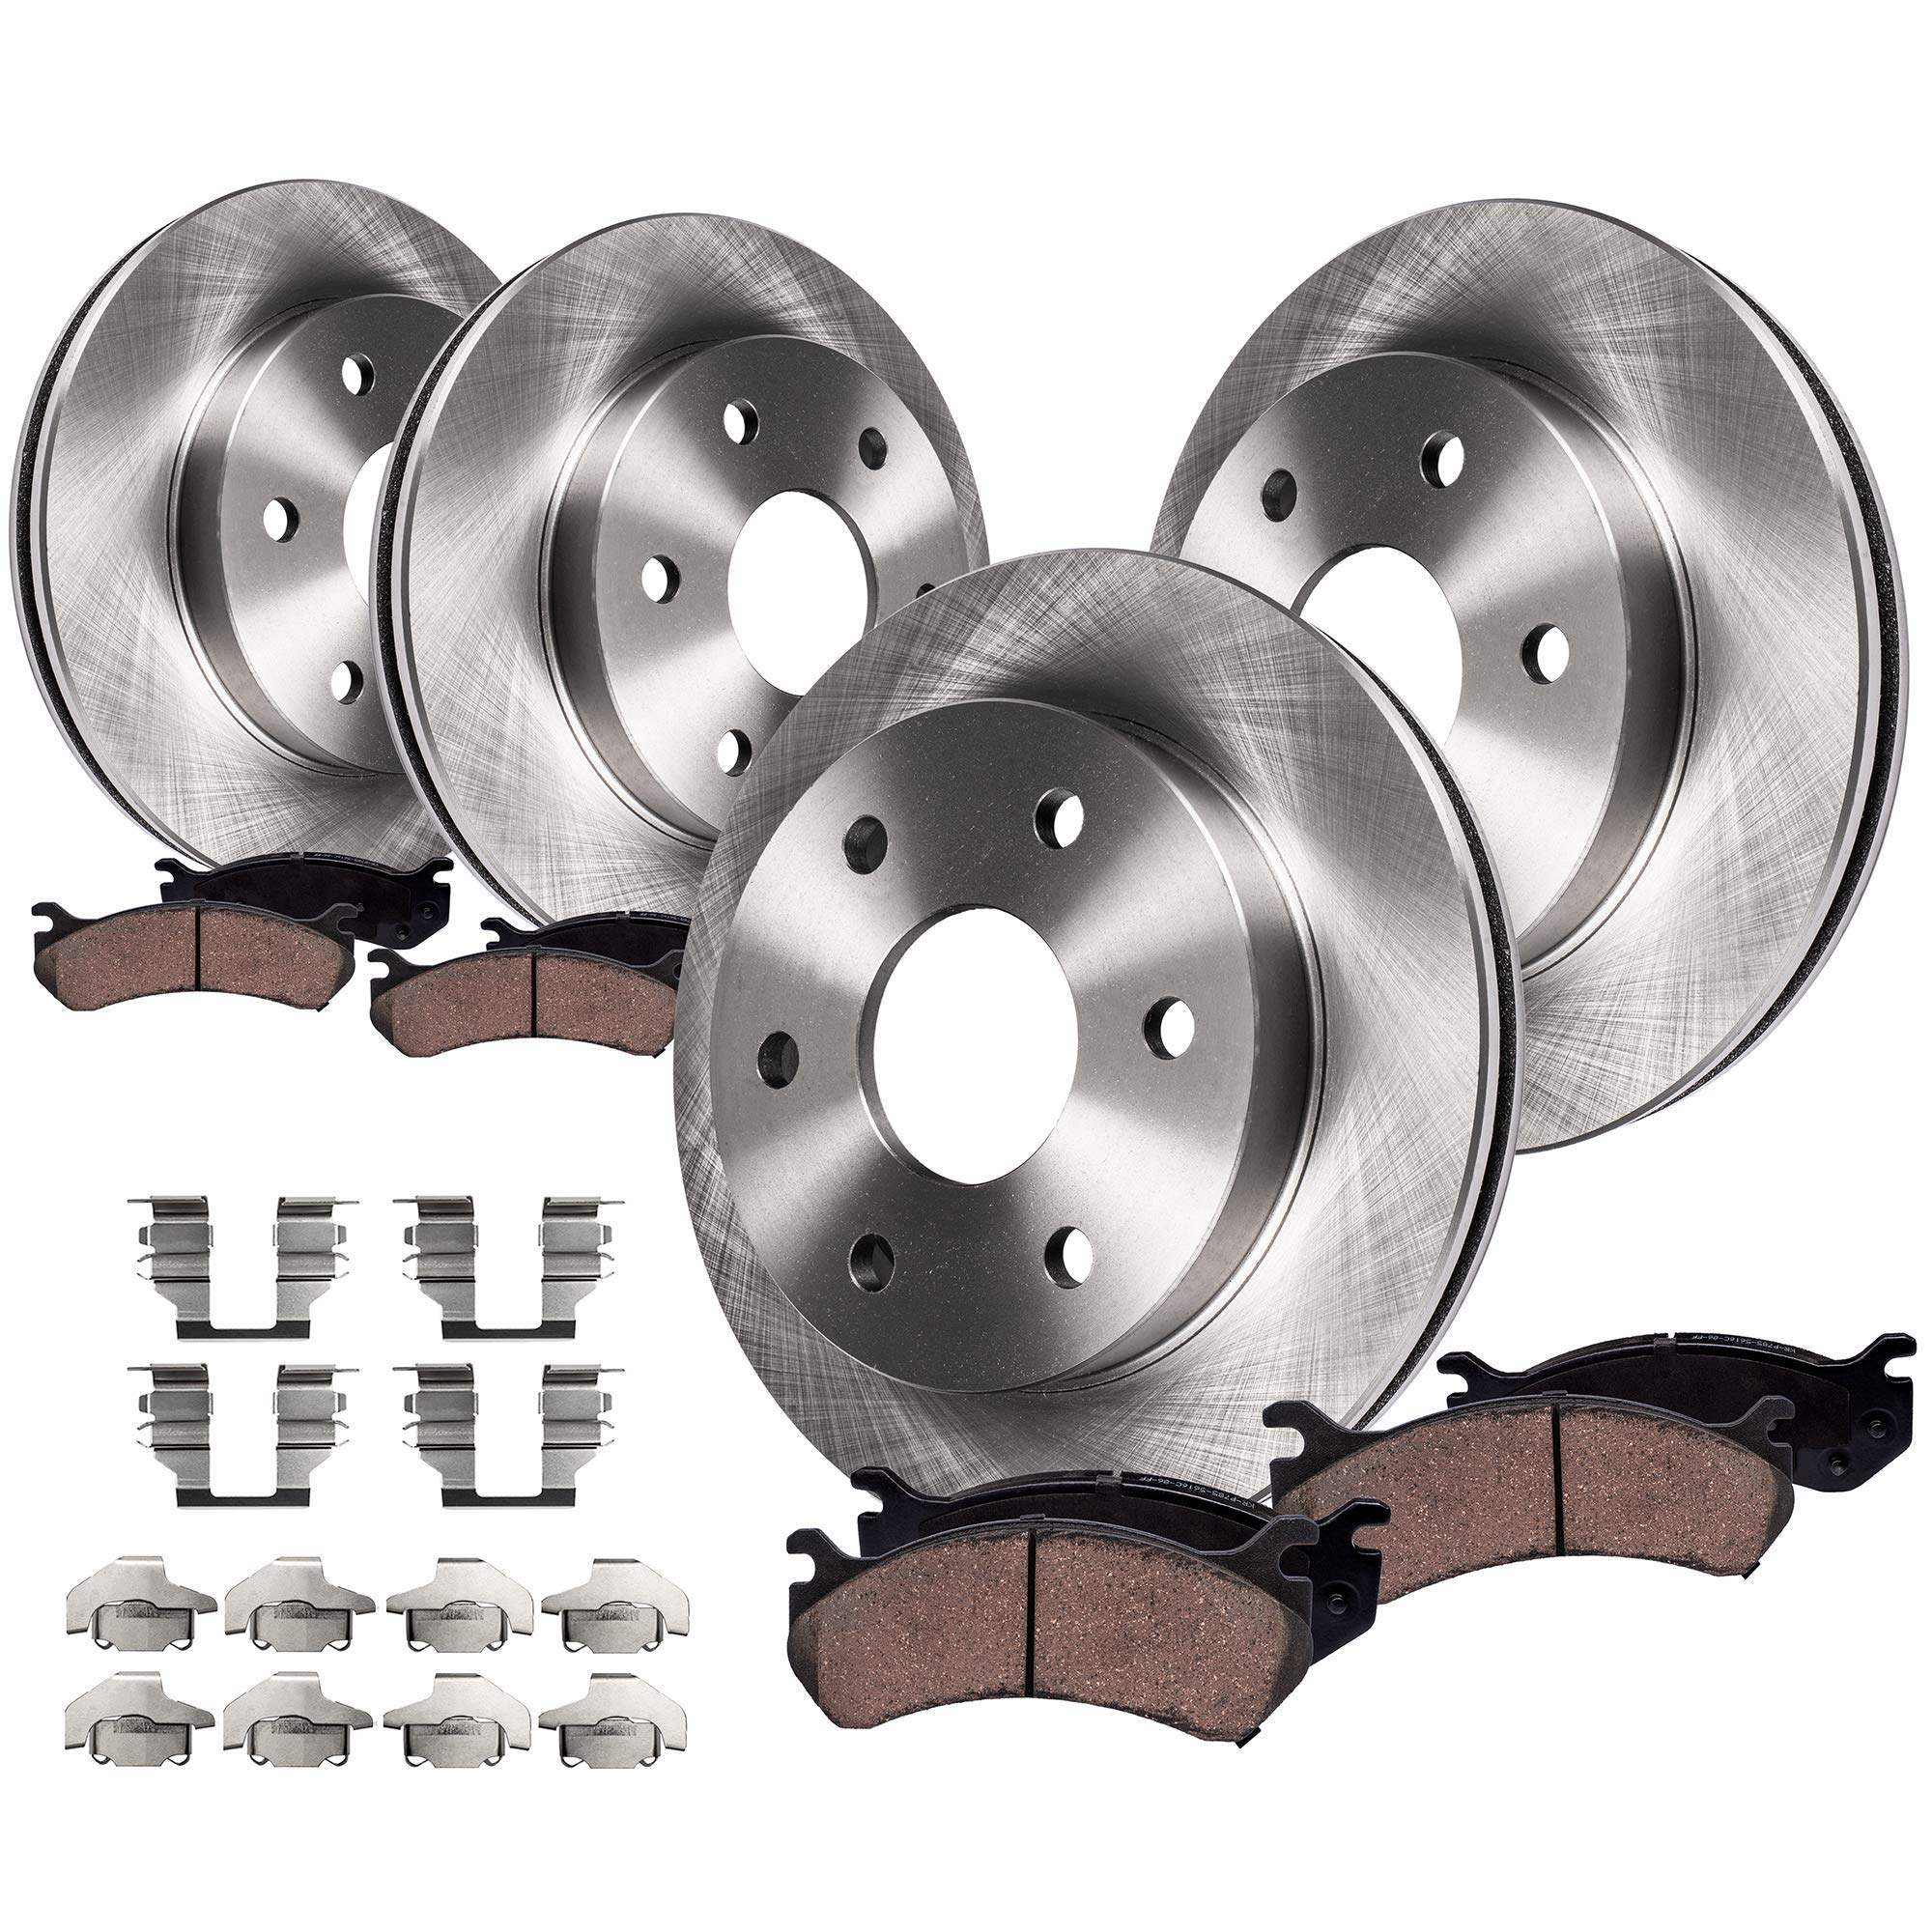 Rotors Ceramic Pads F OE Replacement 03 Chevy Trailblazer EXT 7 Passenger